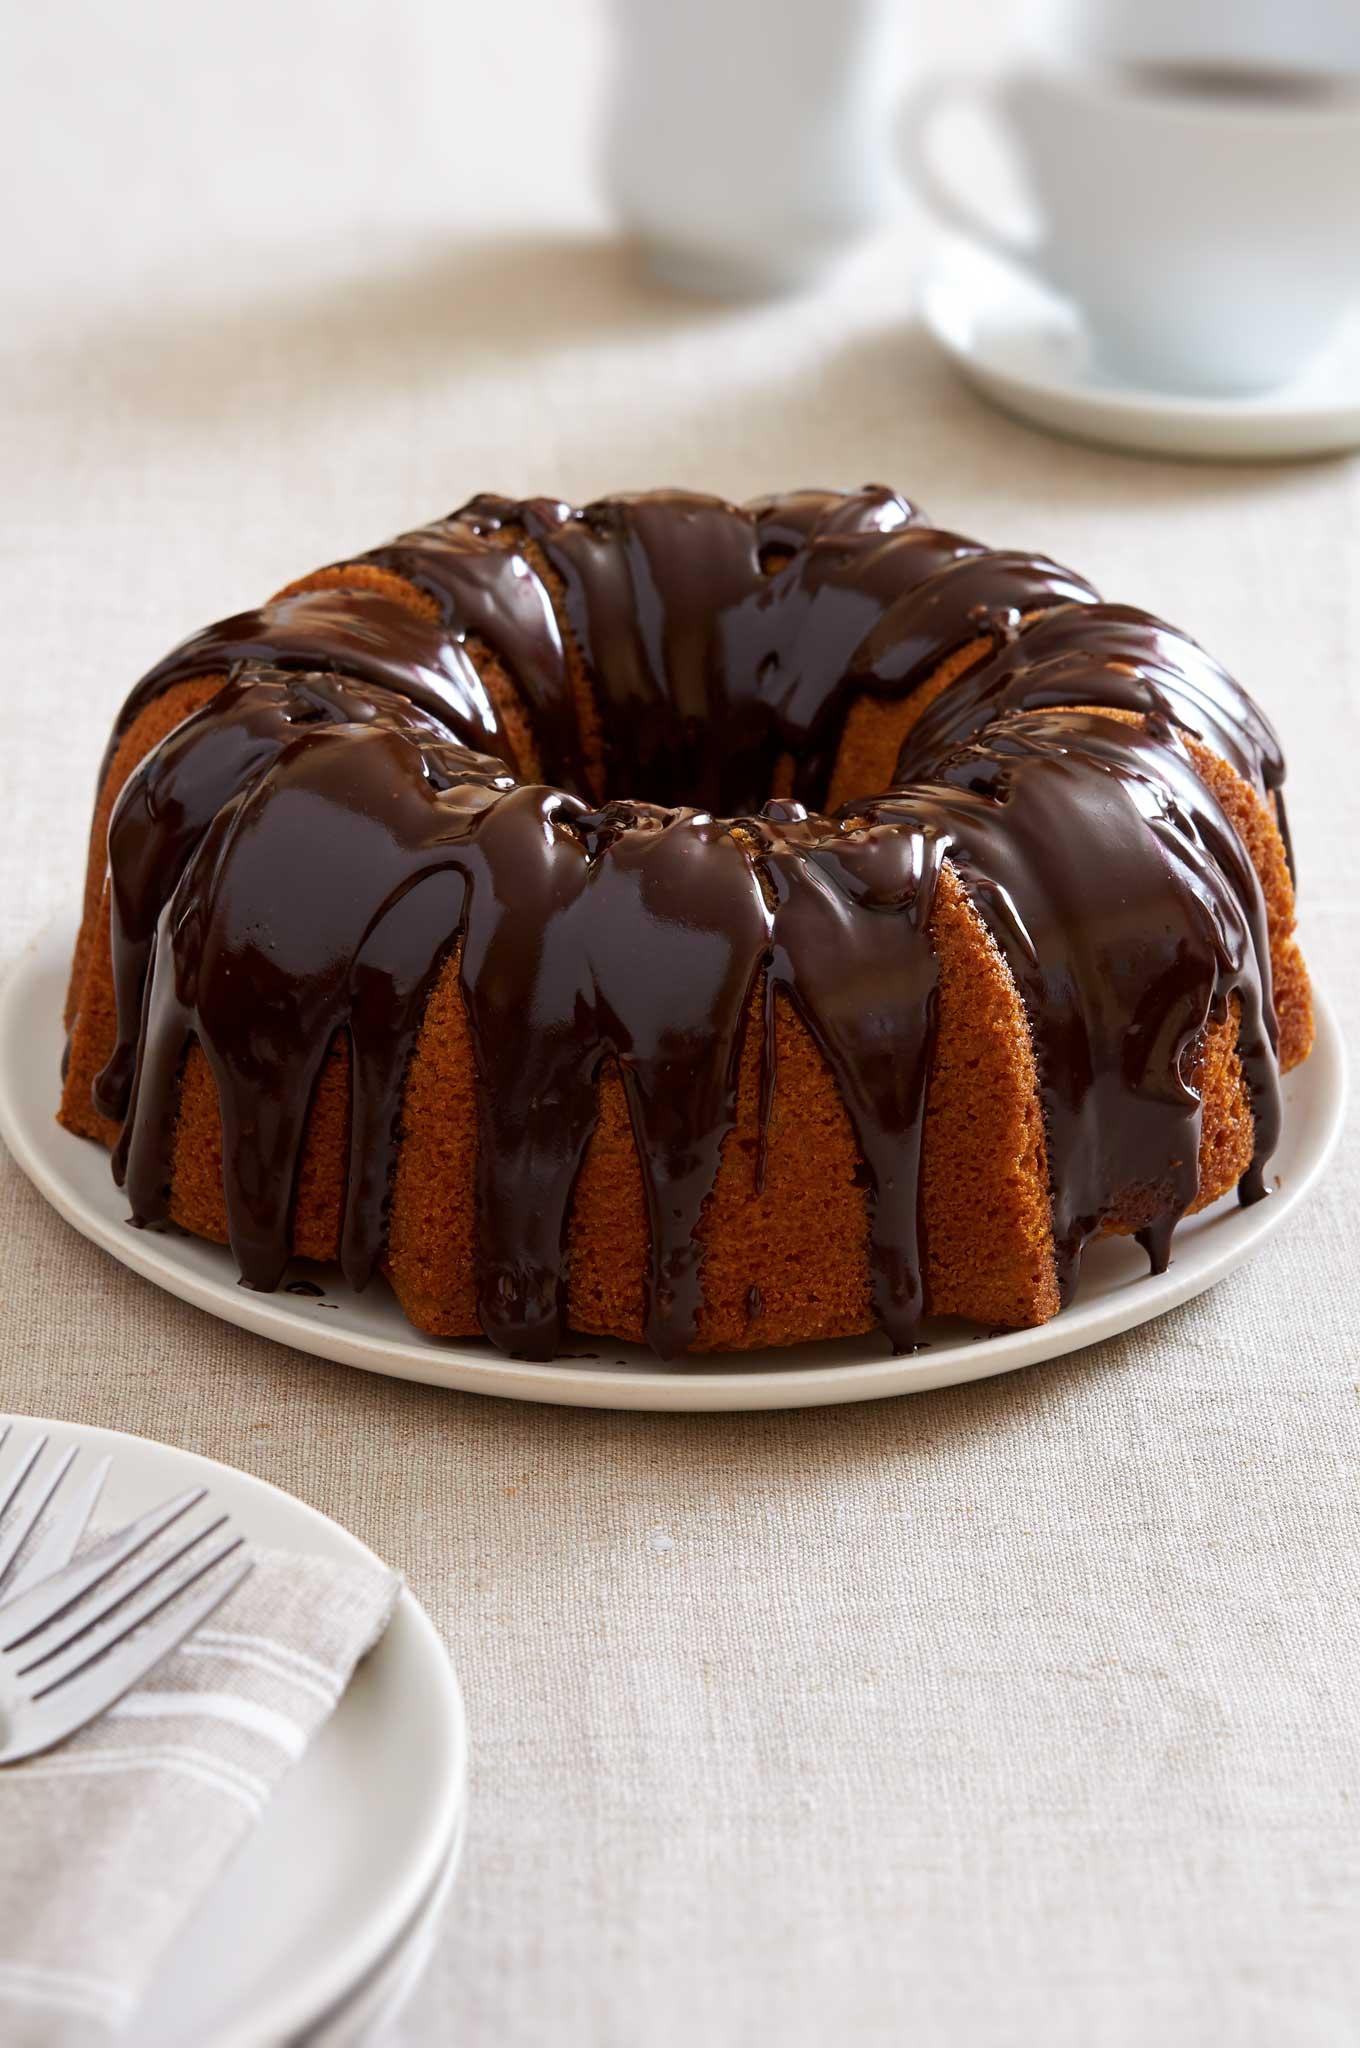 caramel-chocolate-chip-bundt-cake-after